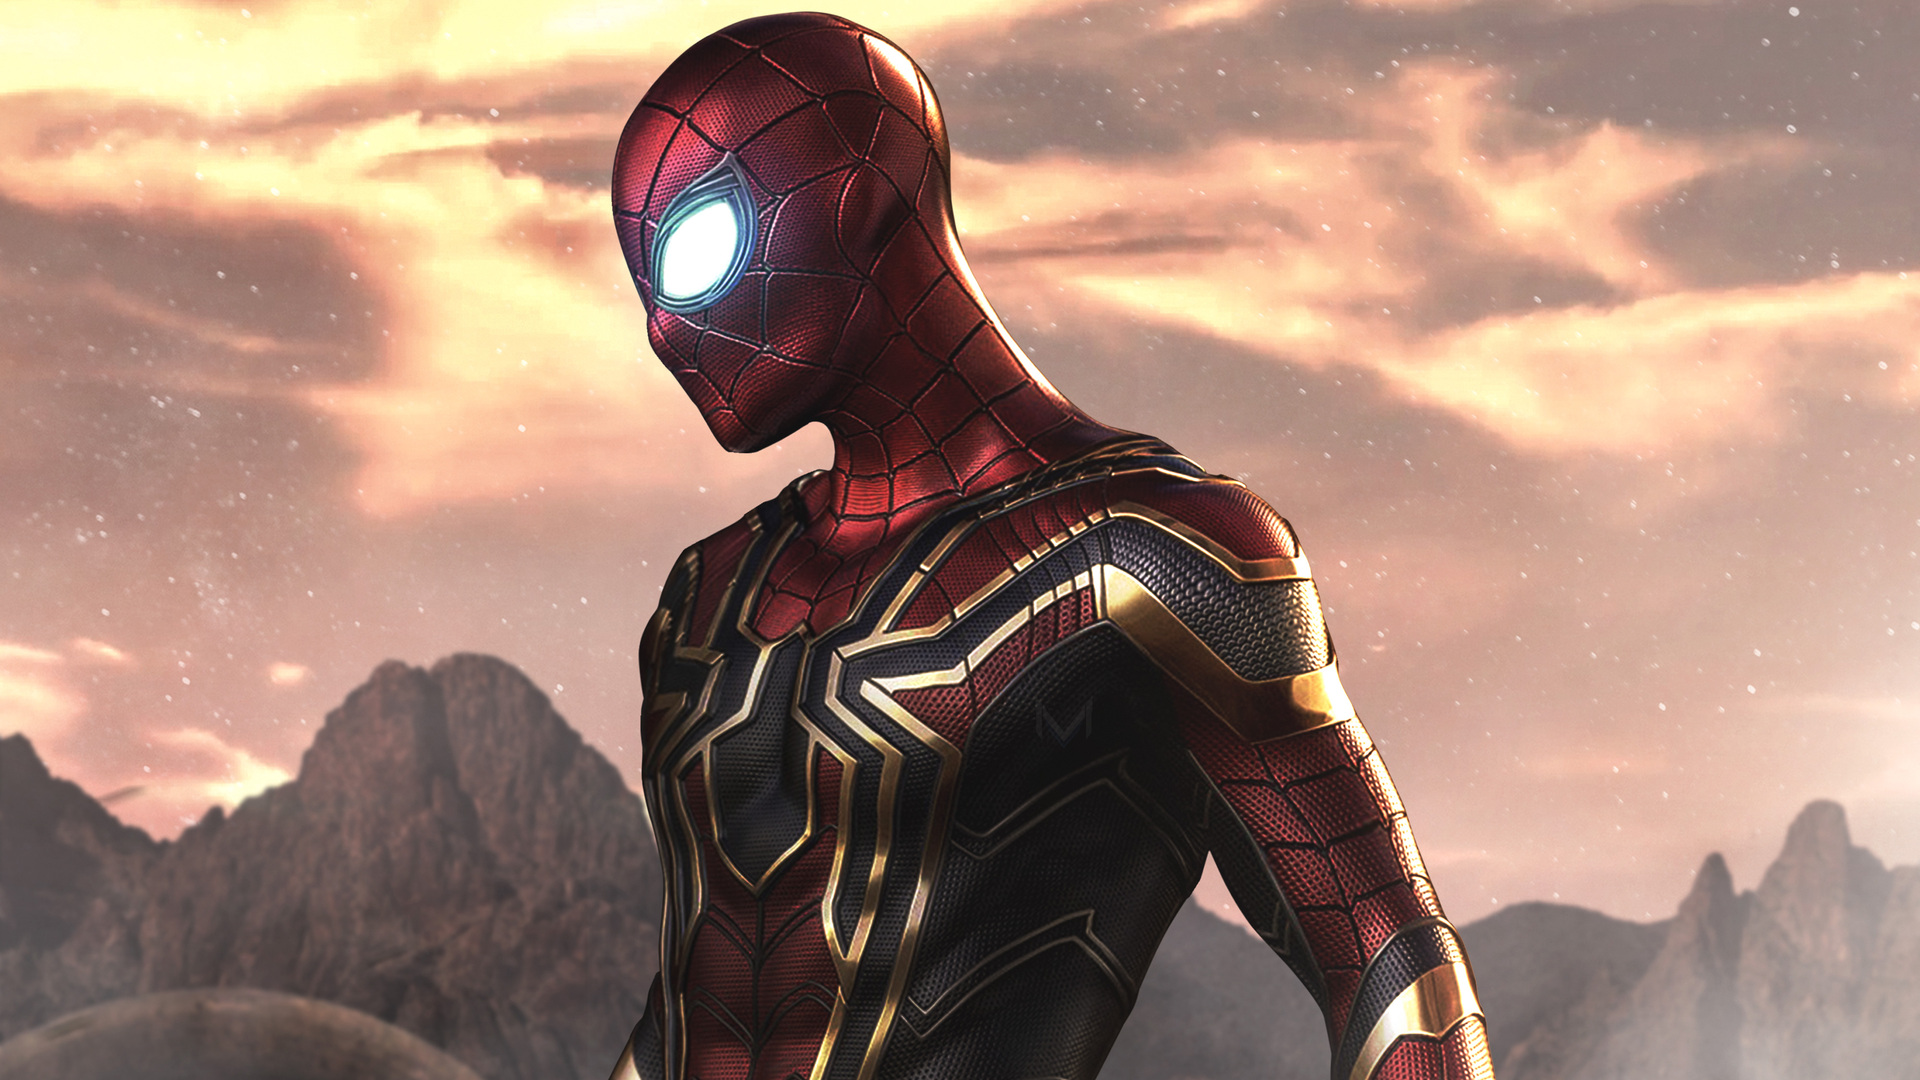 1920x1080 Spiderman Far From Home Movie Laptop Full Hd 1080p Hd 4k